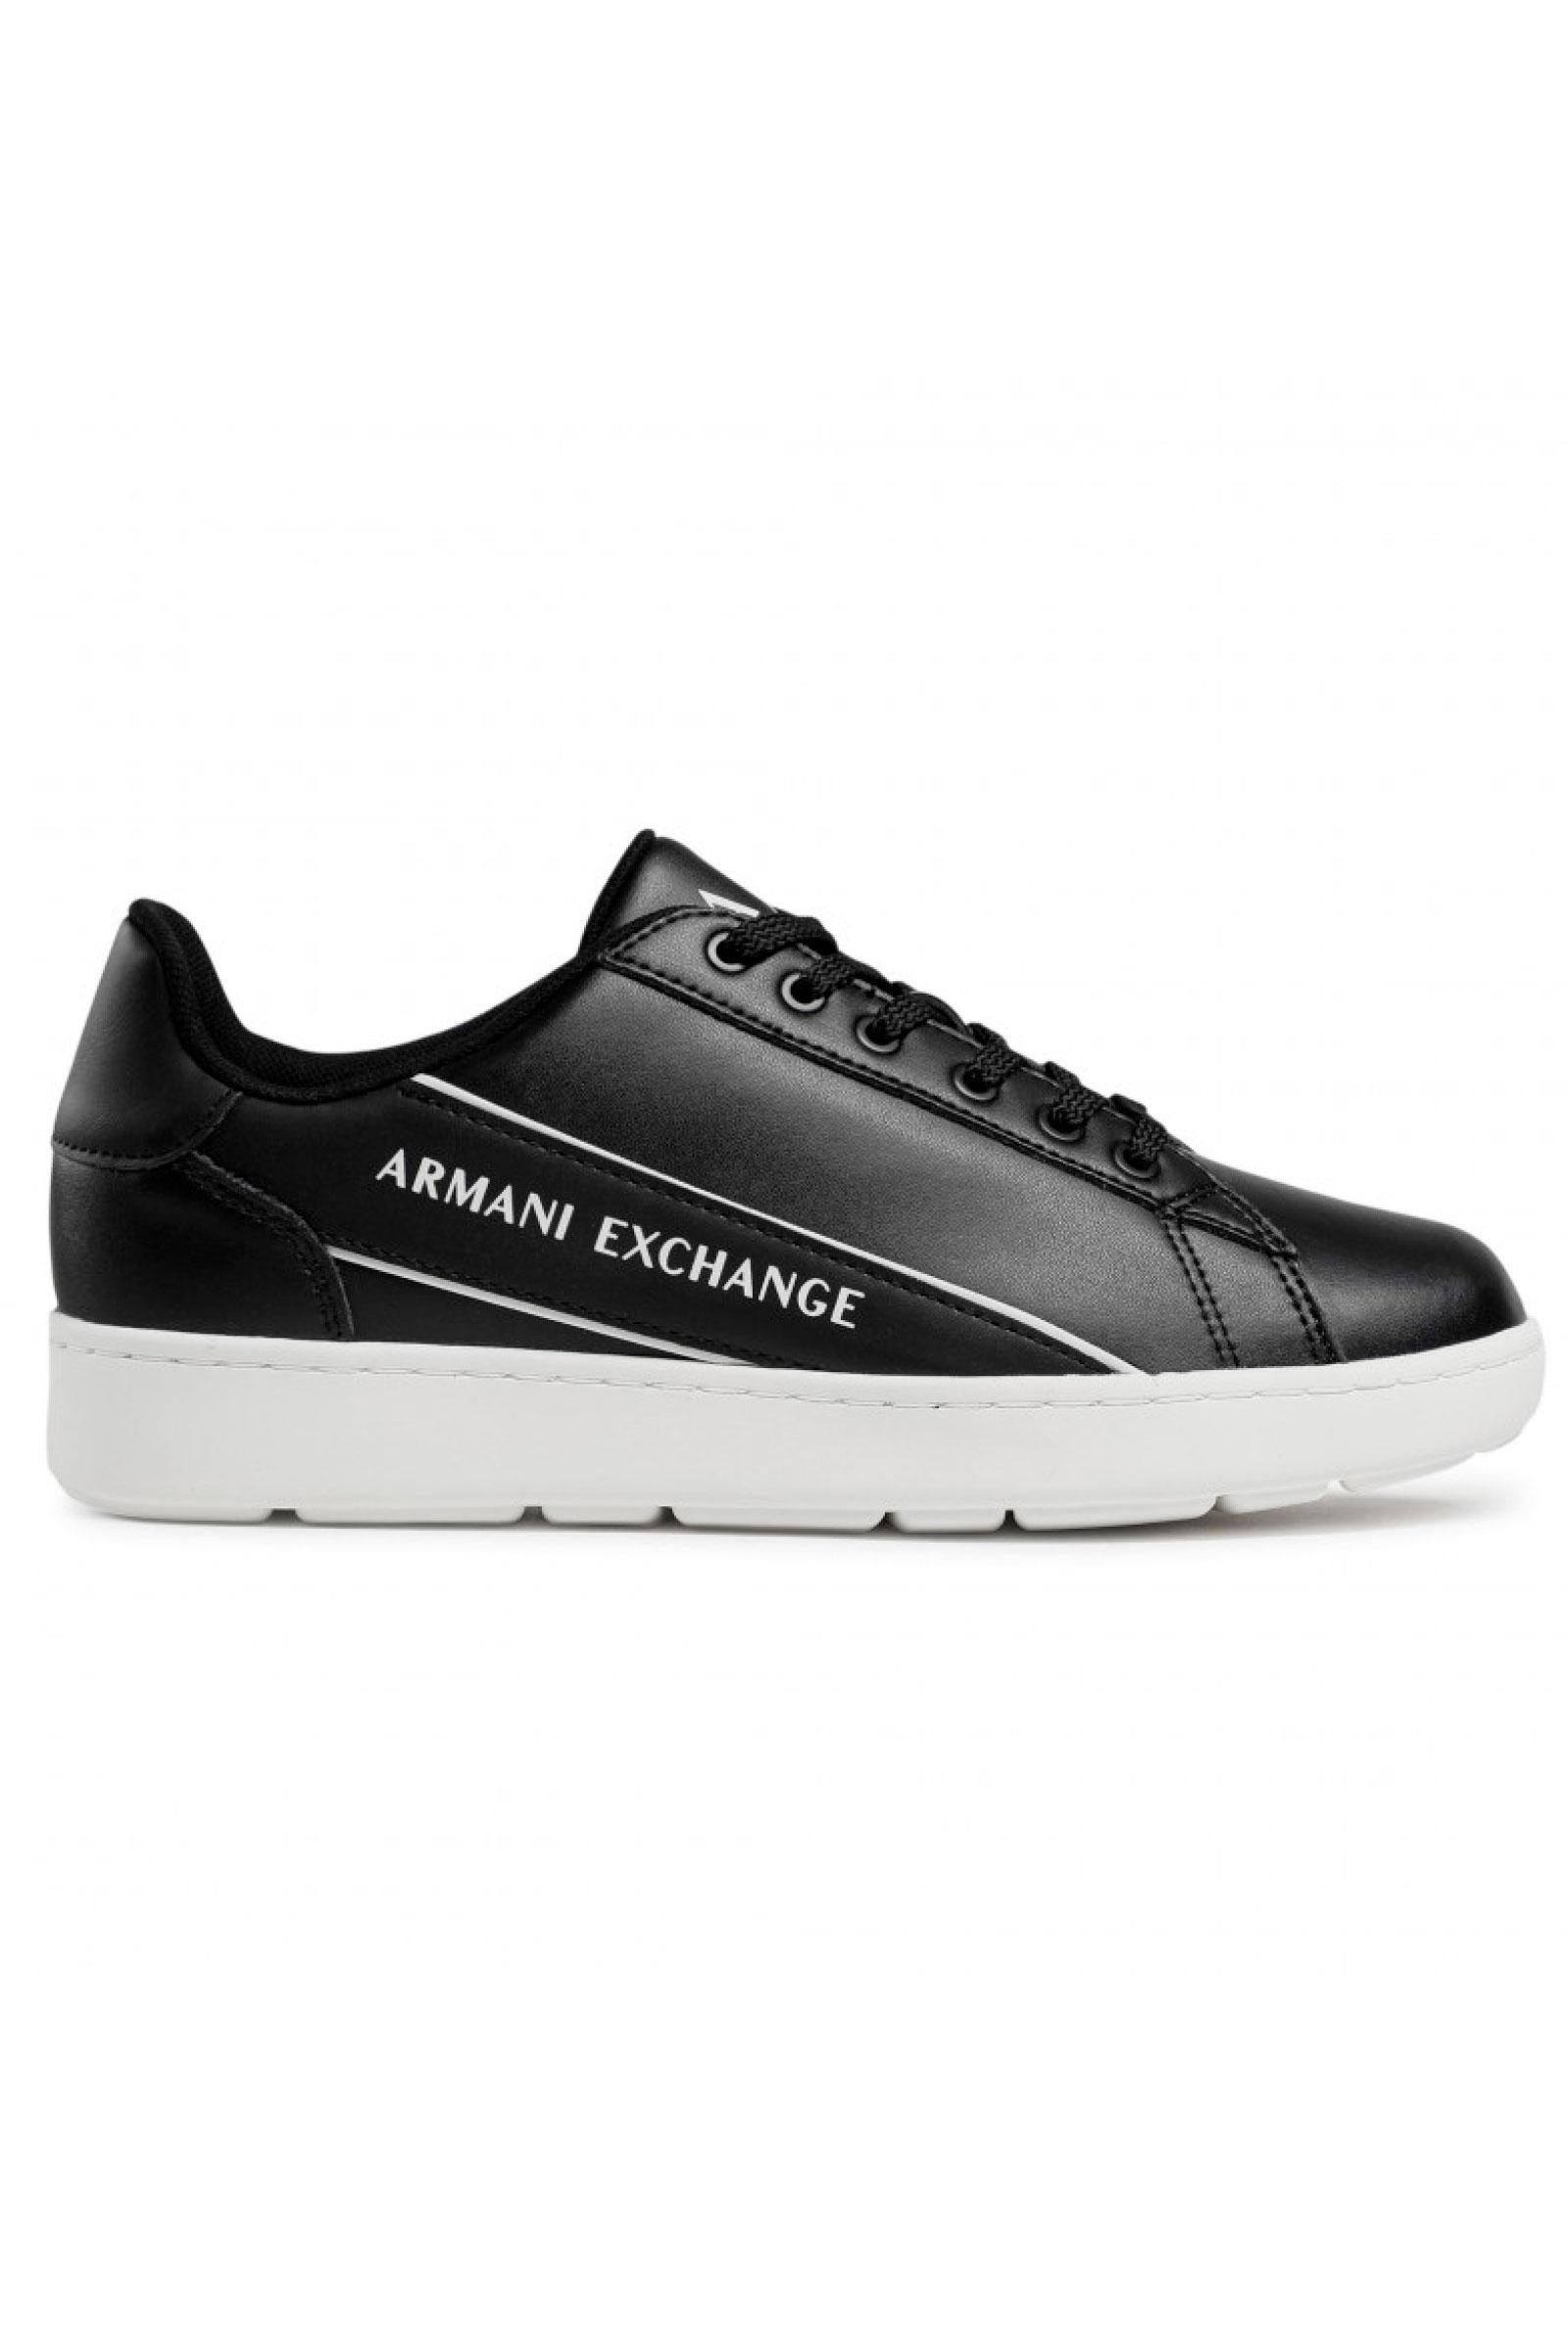 ARMANI EXCHANGE Scarpe Uomo ARMANI EXCHANGE | Scarpe | XUX082 XV262N814